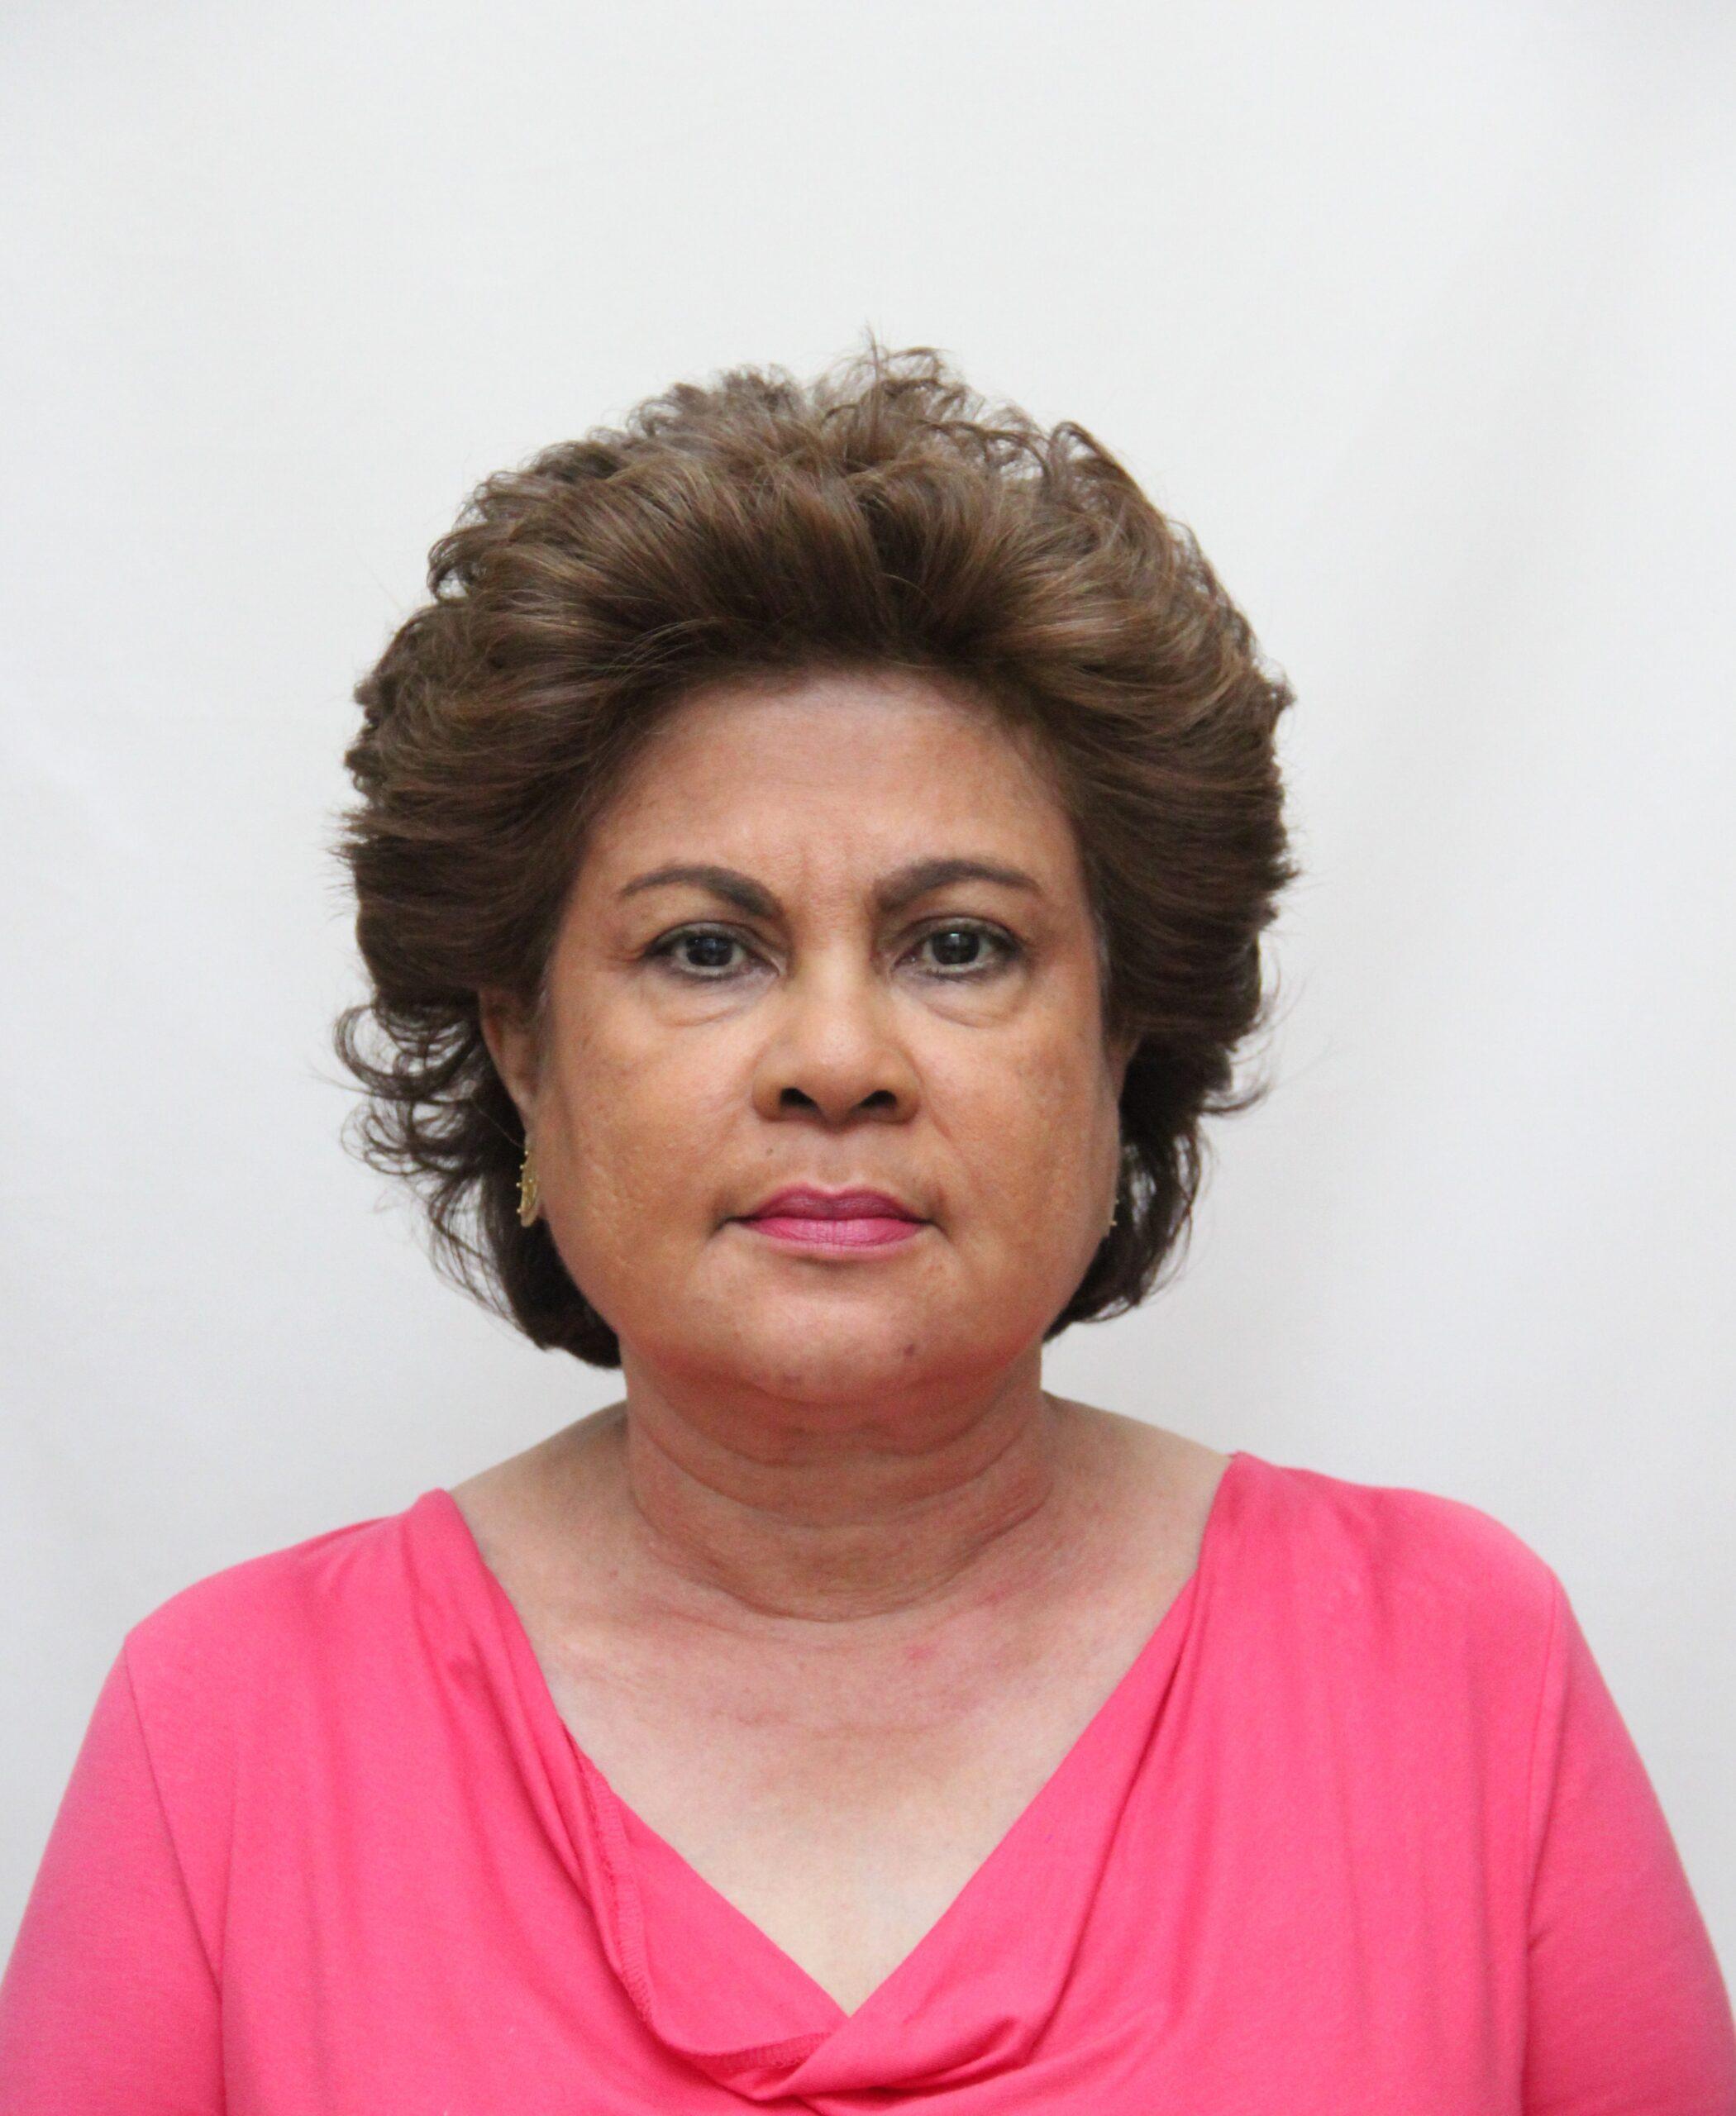 Hon. Simone Marie-Anne de Comarmond